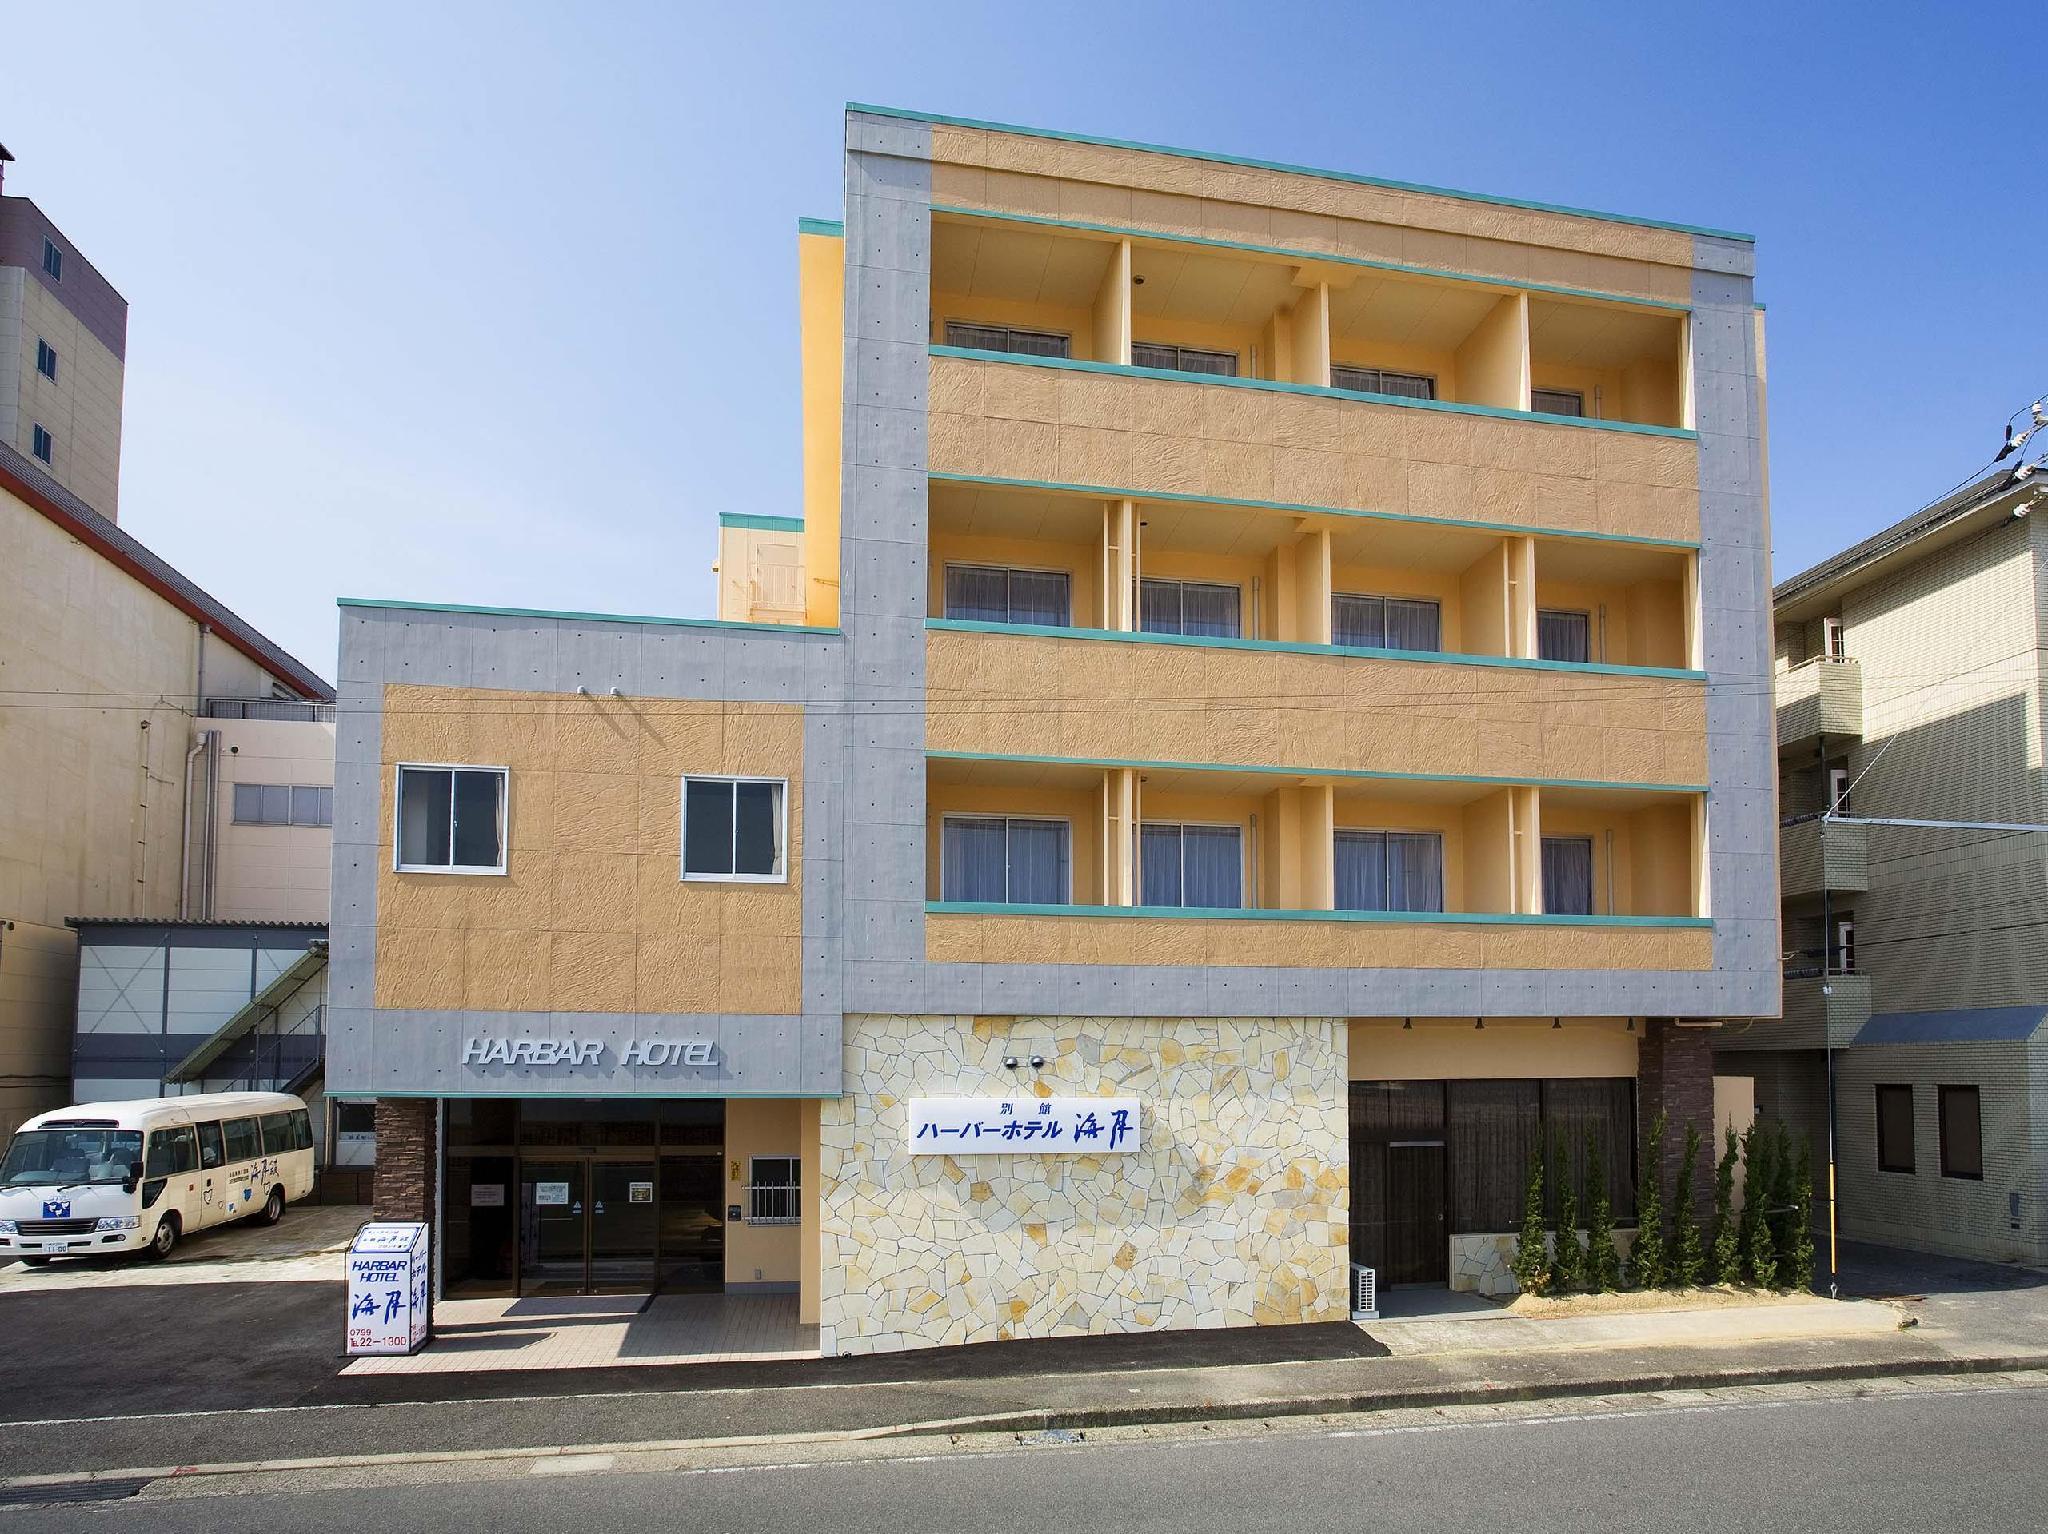 Harbor Hotel Kaigetsu